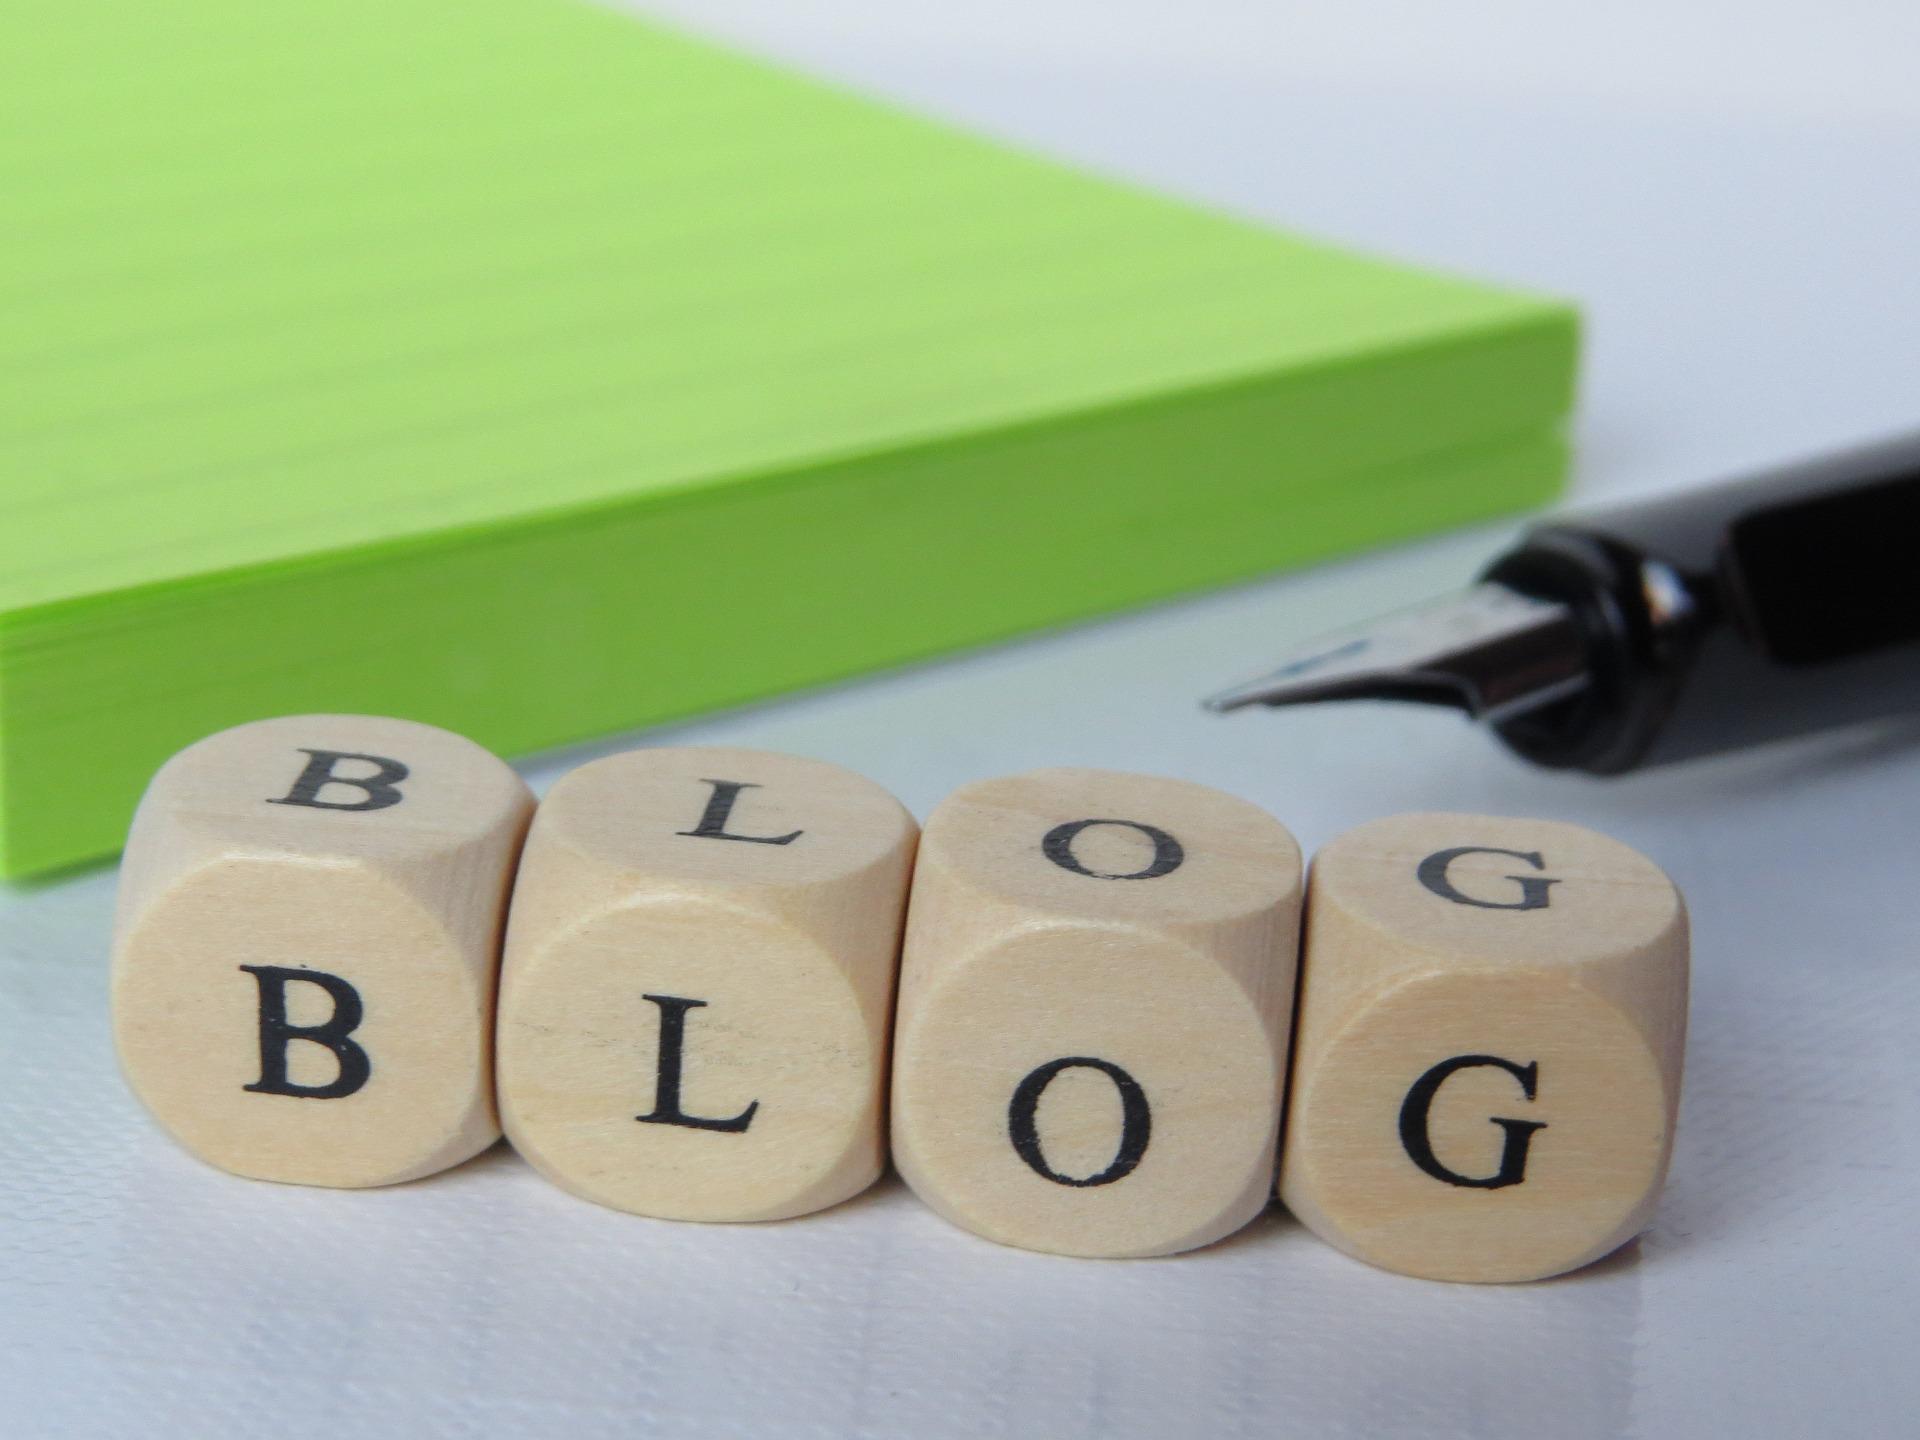 blog 684748 1920